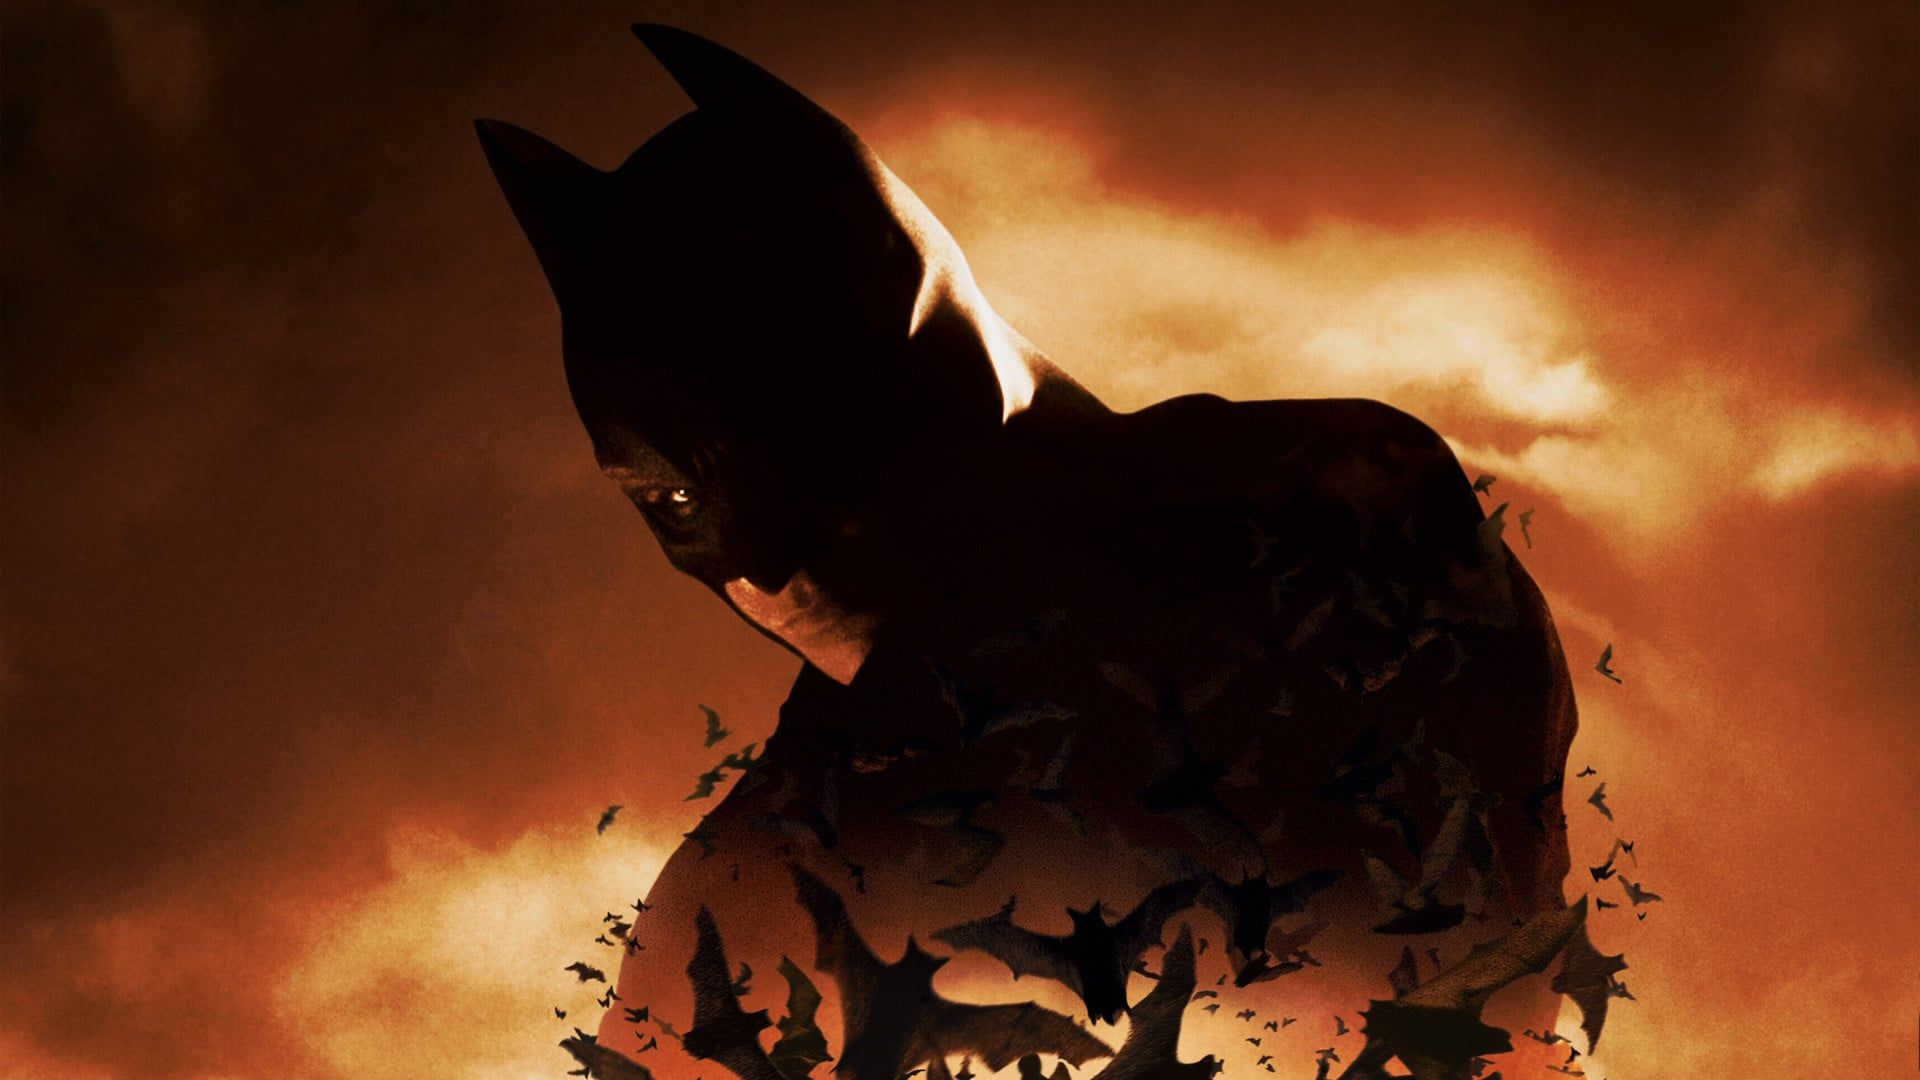 Watch Batman Begins 2005 Putlocker Film Complet Streaming Wie Wurde Bruce Wayne Zu Batman Als Kleiner Junge Mus In 2020 Batman Begins Batman Begins Movie Batman Movie